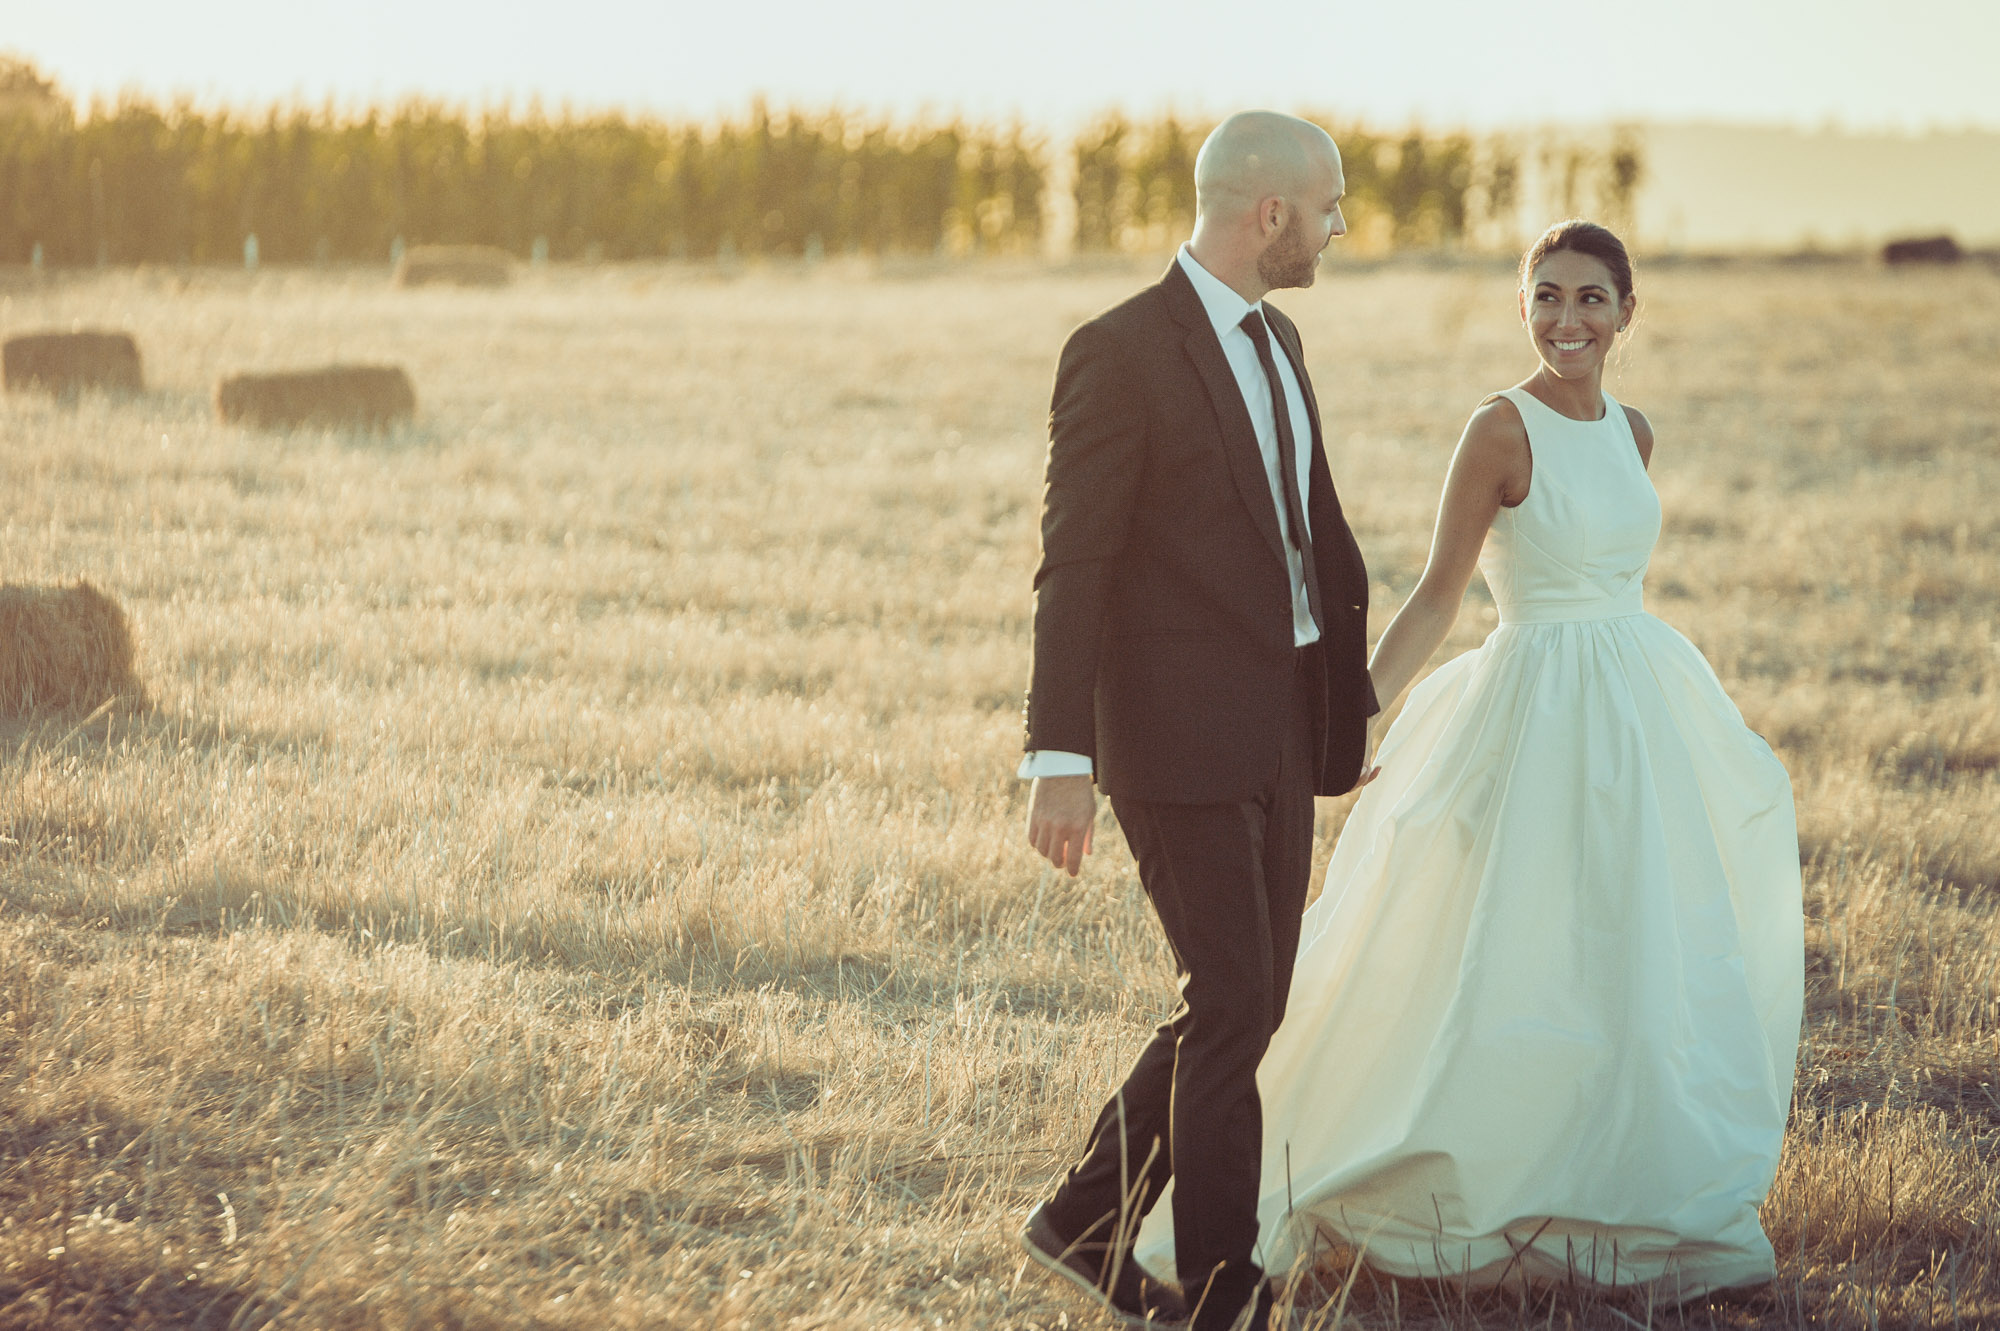 john-henry-wedding-photographer-kiara-ashley-001-27.jpg